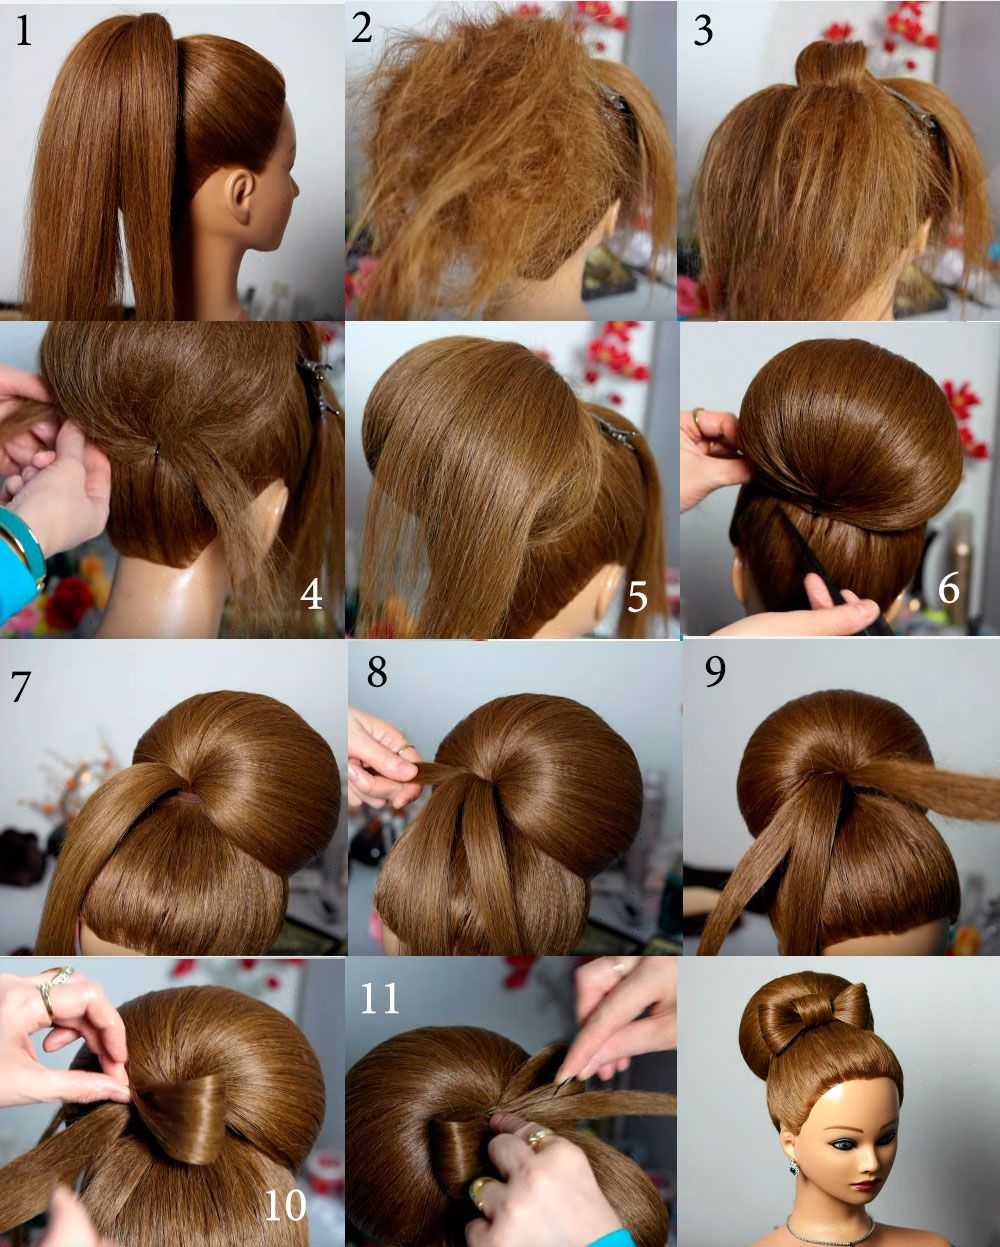 Причёска бабетта своими руками 110